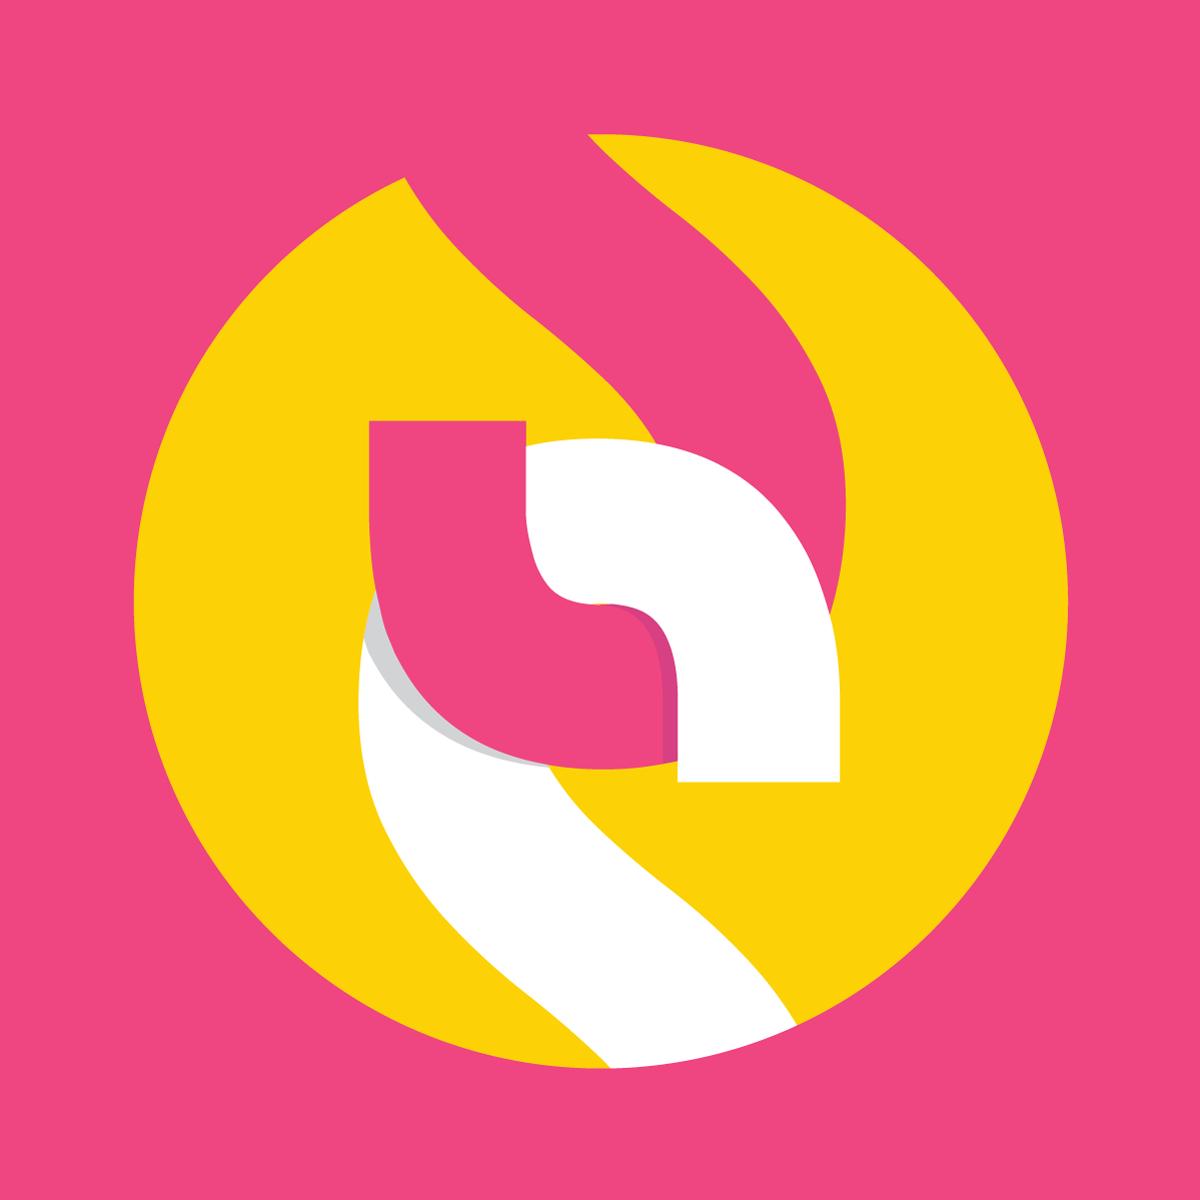 SubscribeStar Logomark Pink